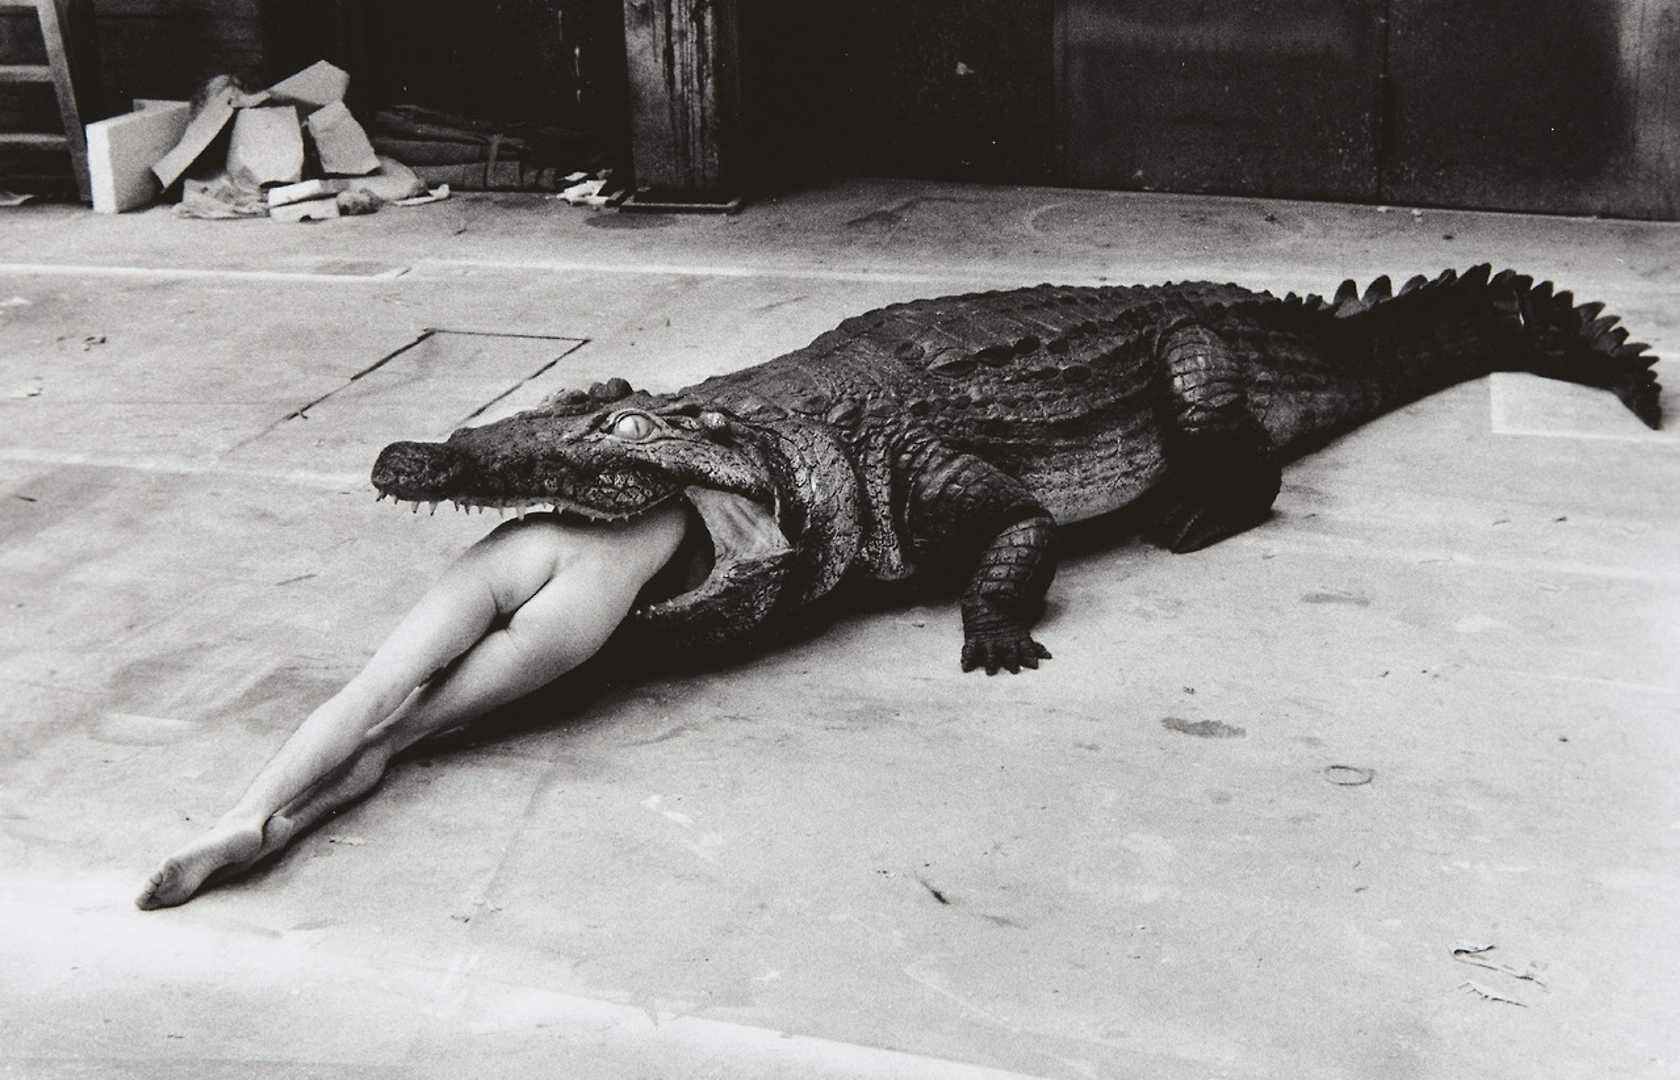 Crocodile eating Ballerina